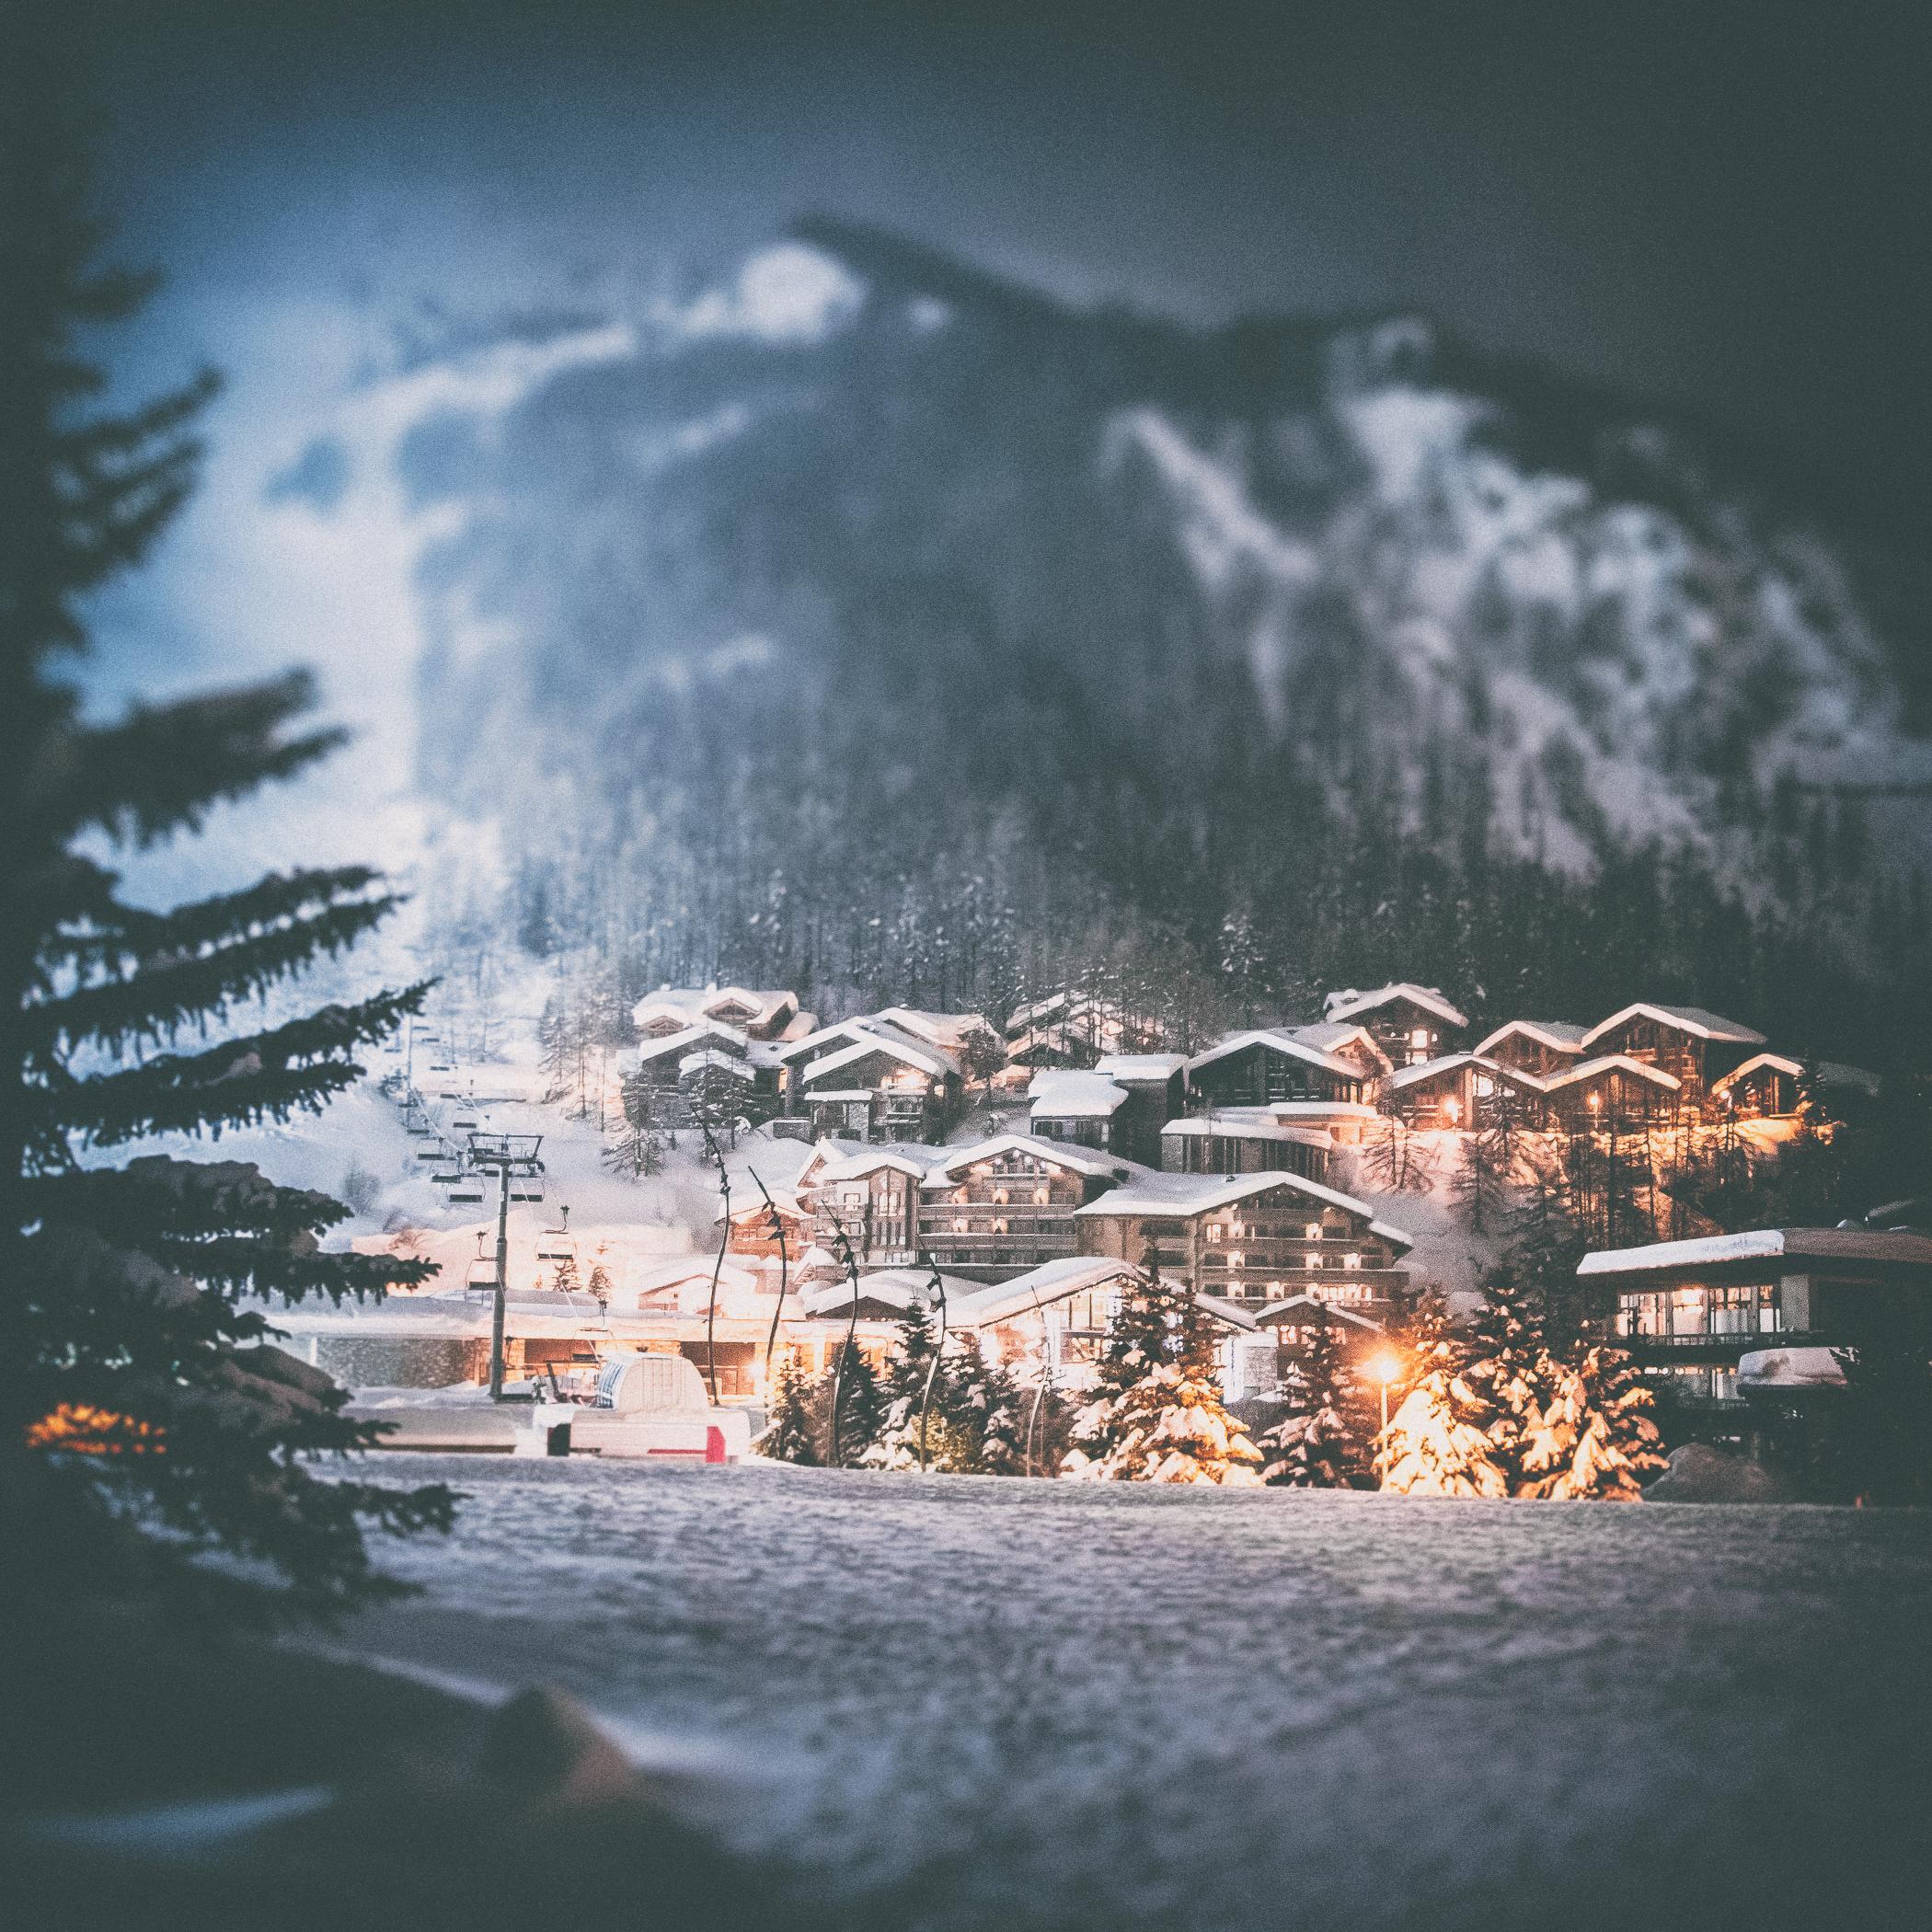 Top 20 Christmas Destinations